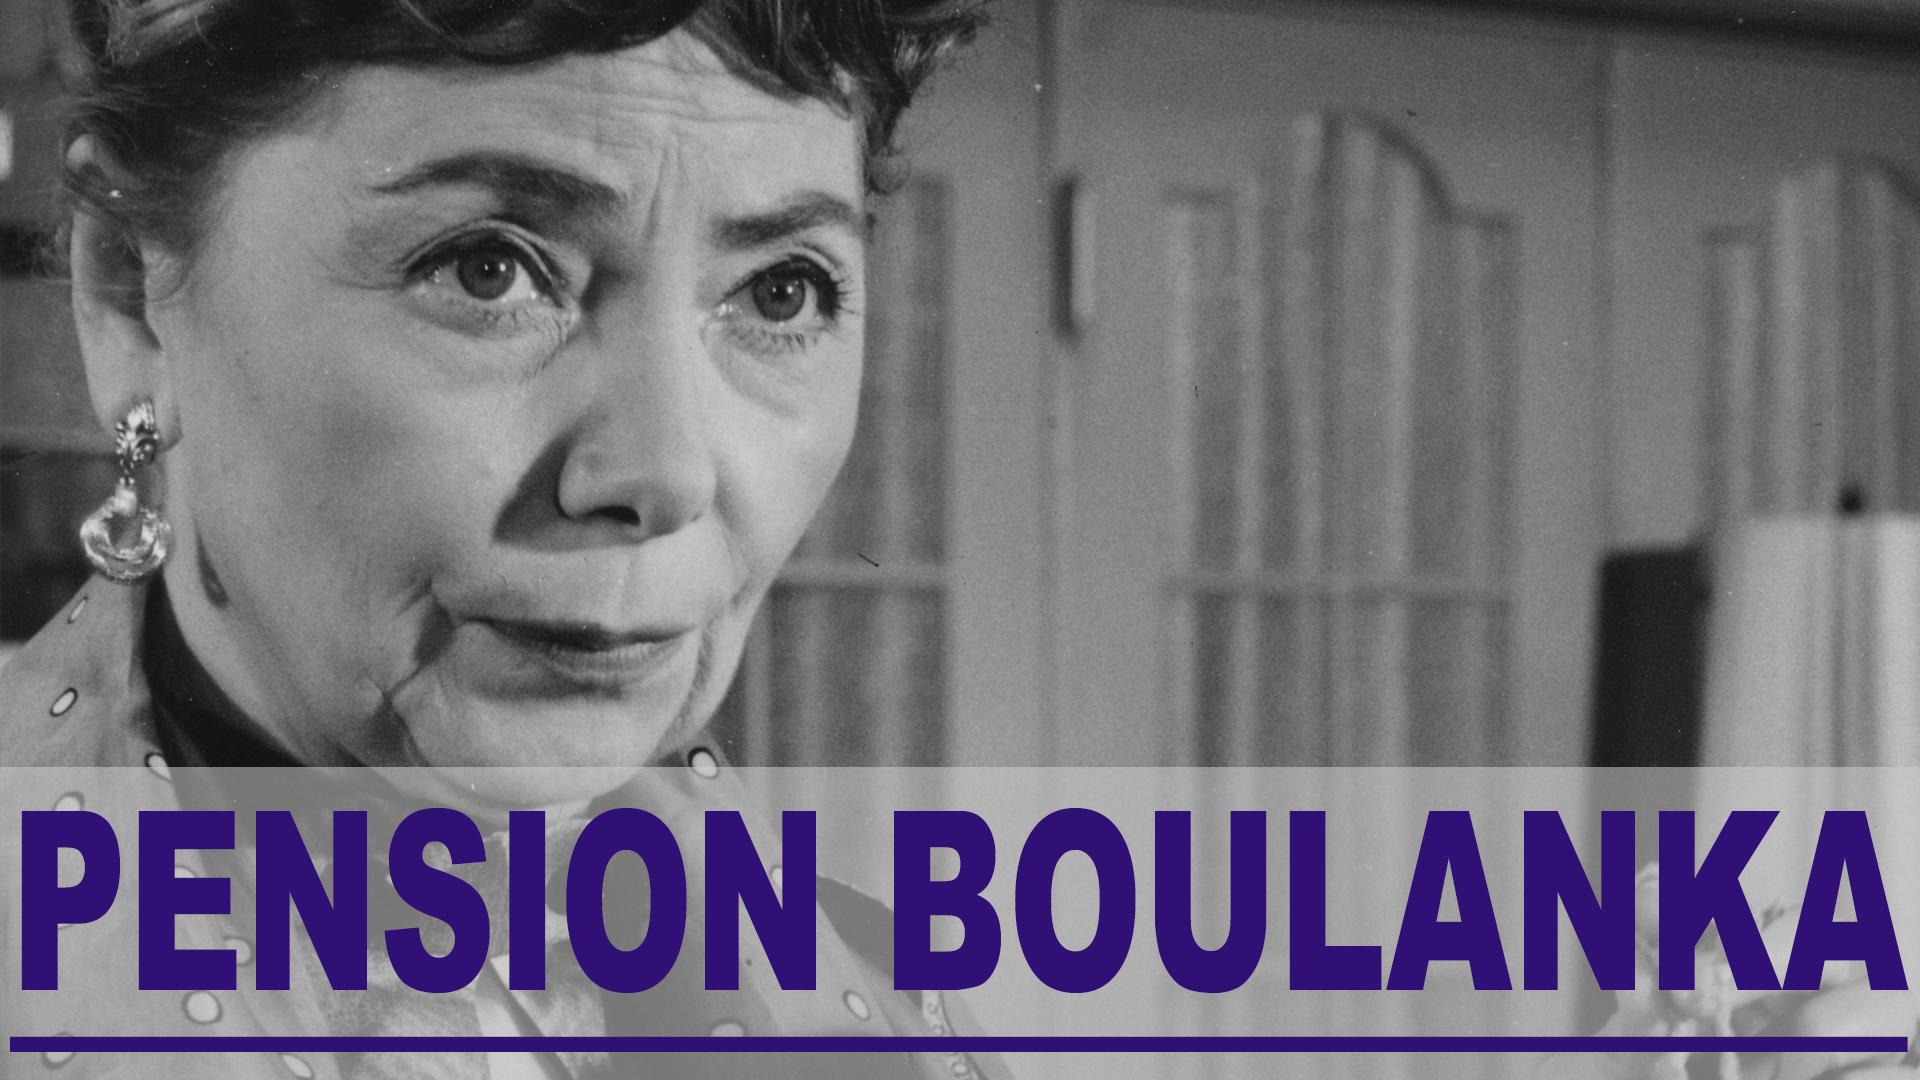 Pension Boulanka